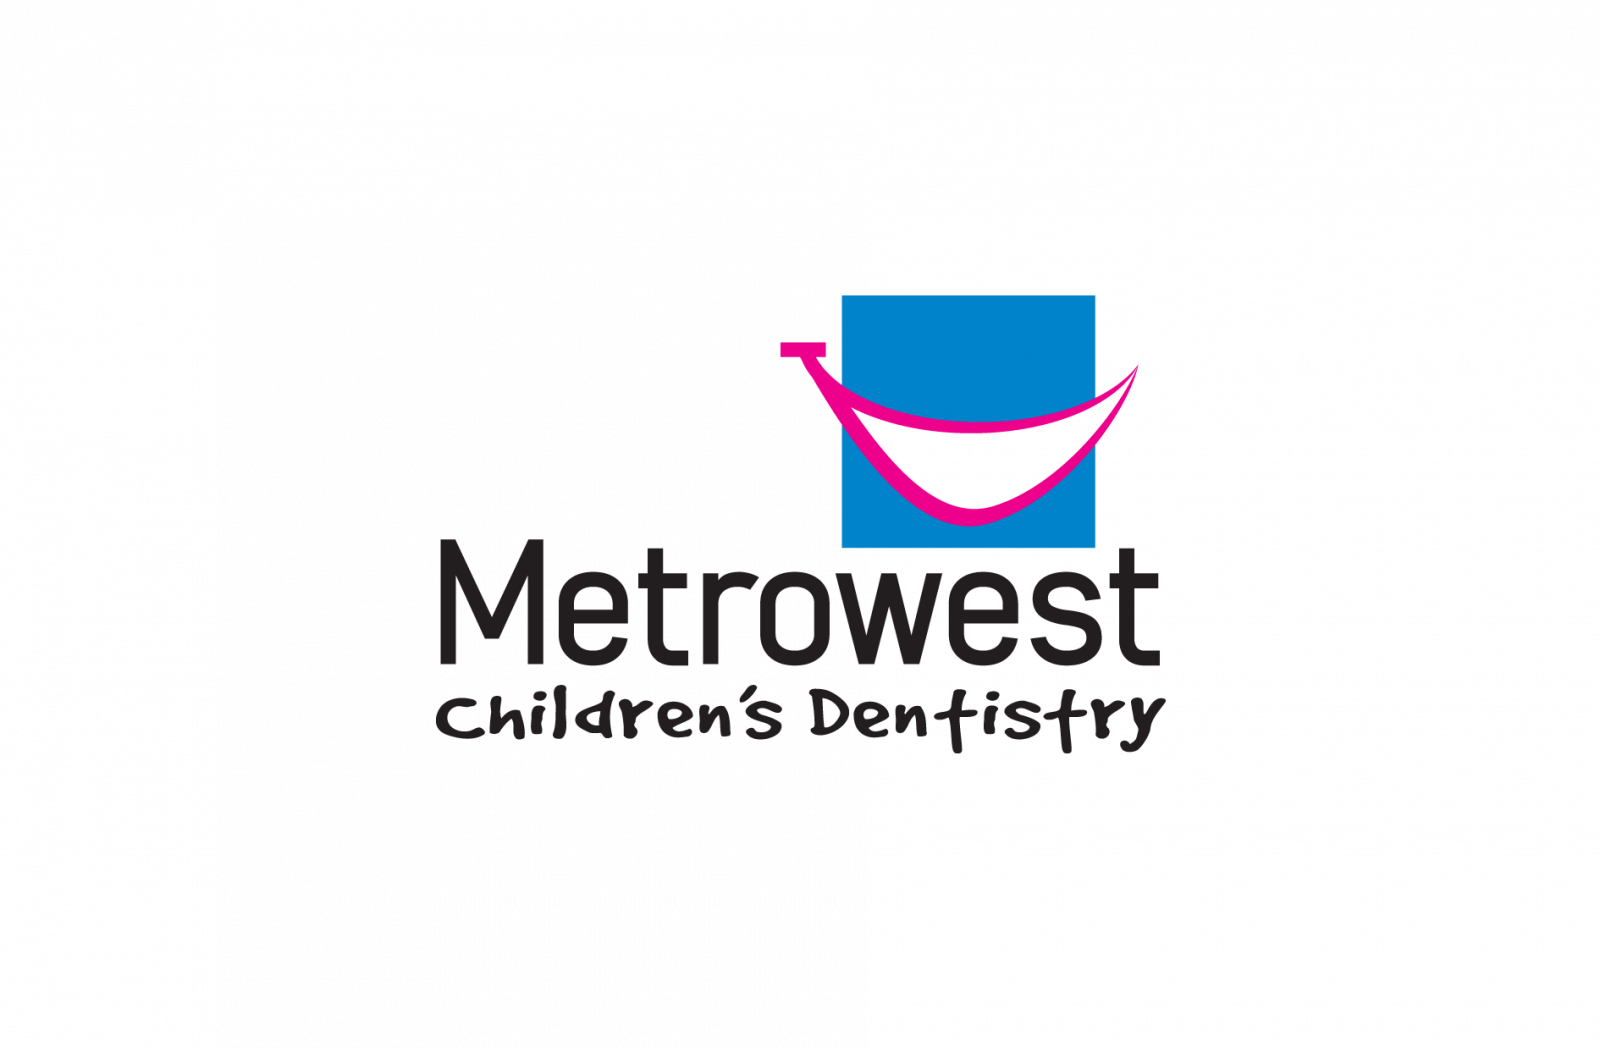 Metrowest Children's Dentistry Logo